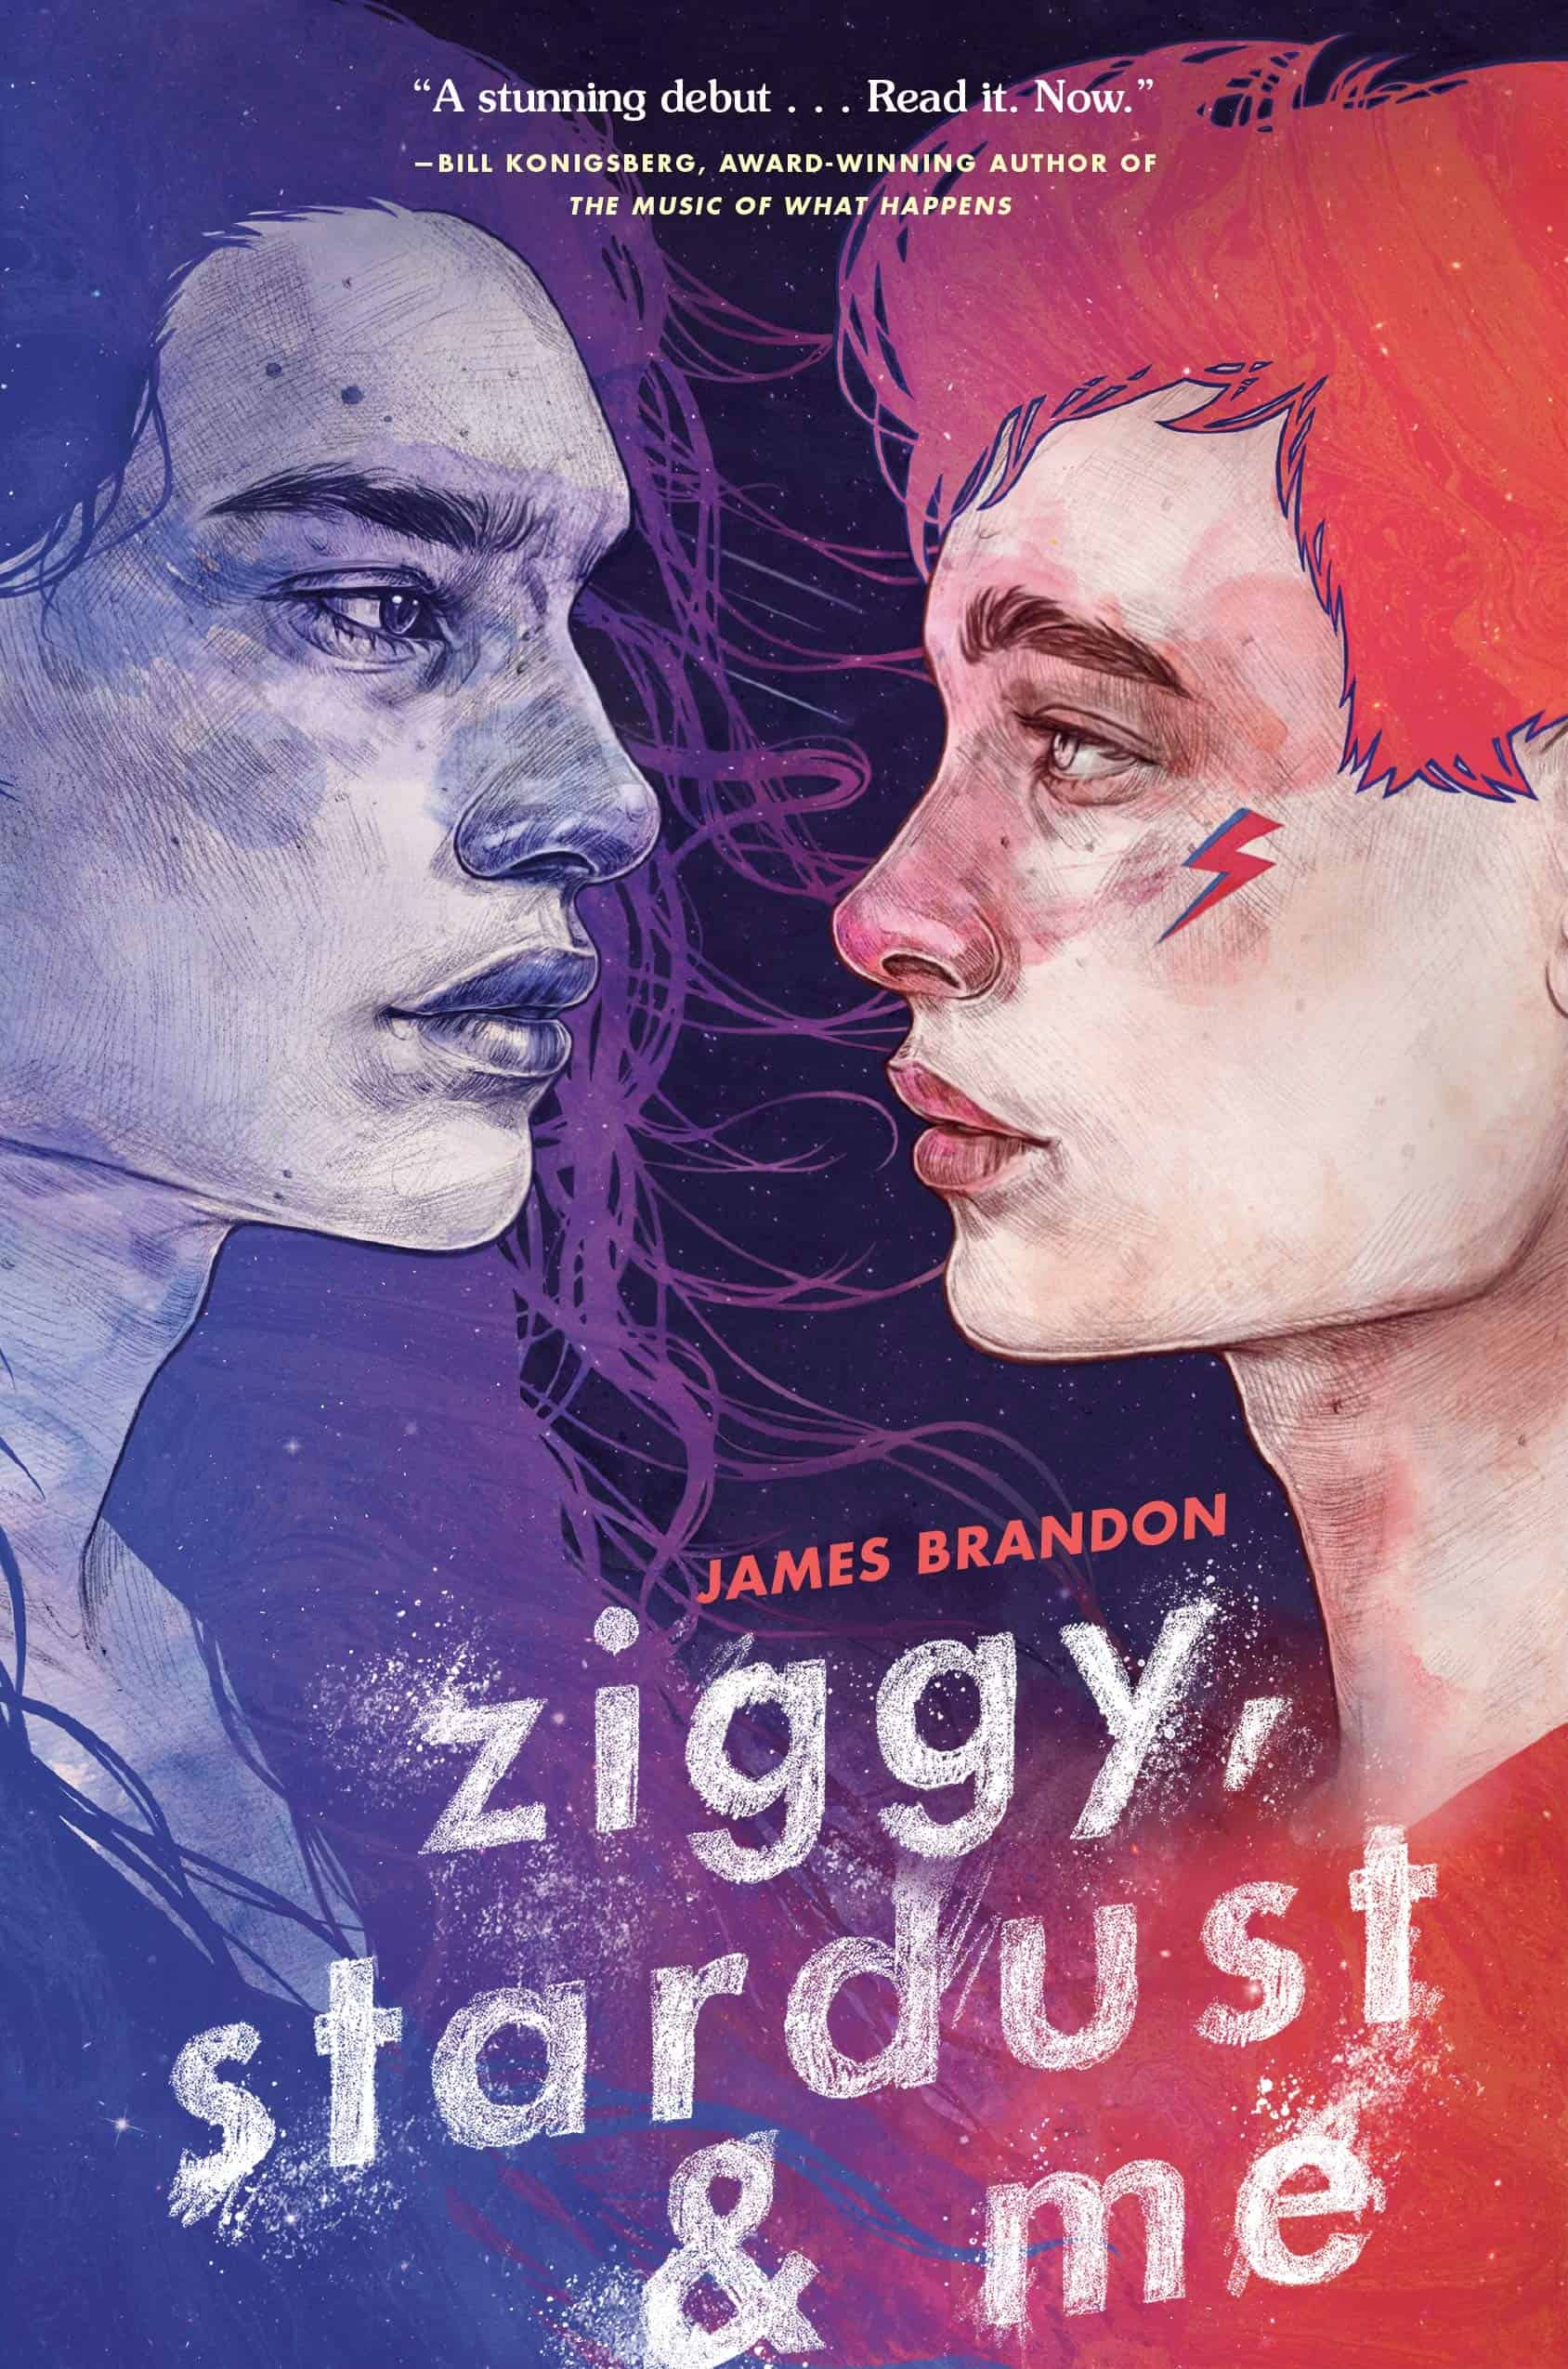 ziggy stardust and me